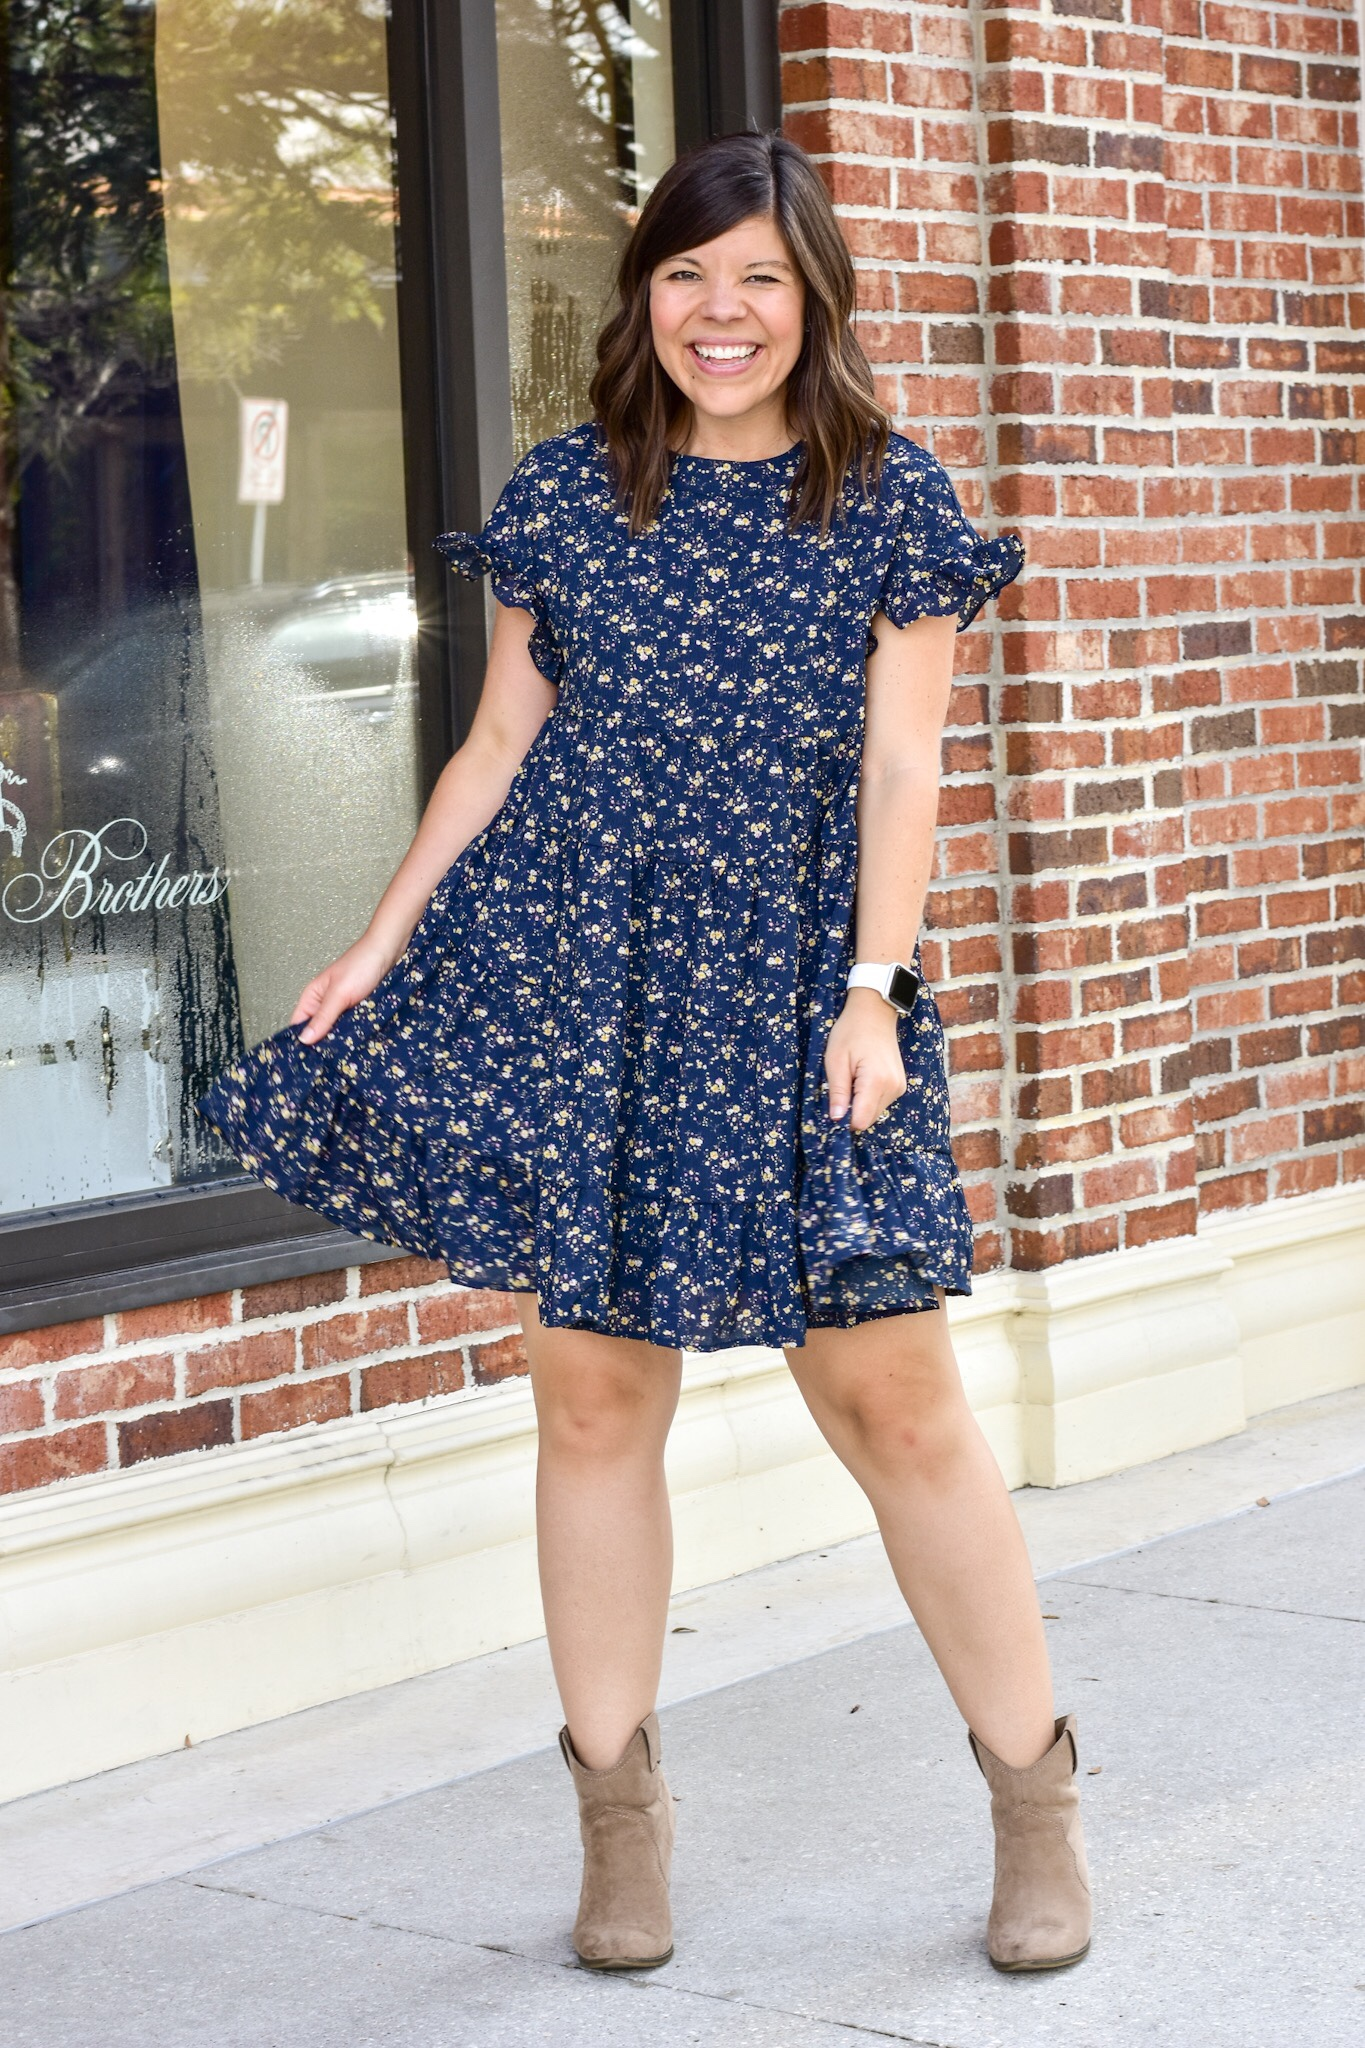 Prime Find: A Twirl-Worthy Dress